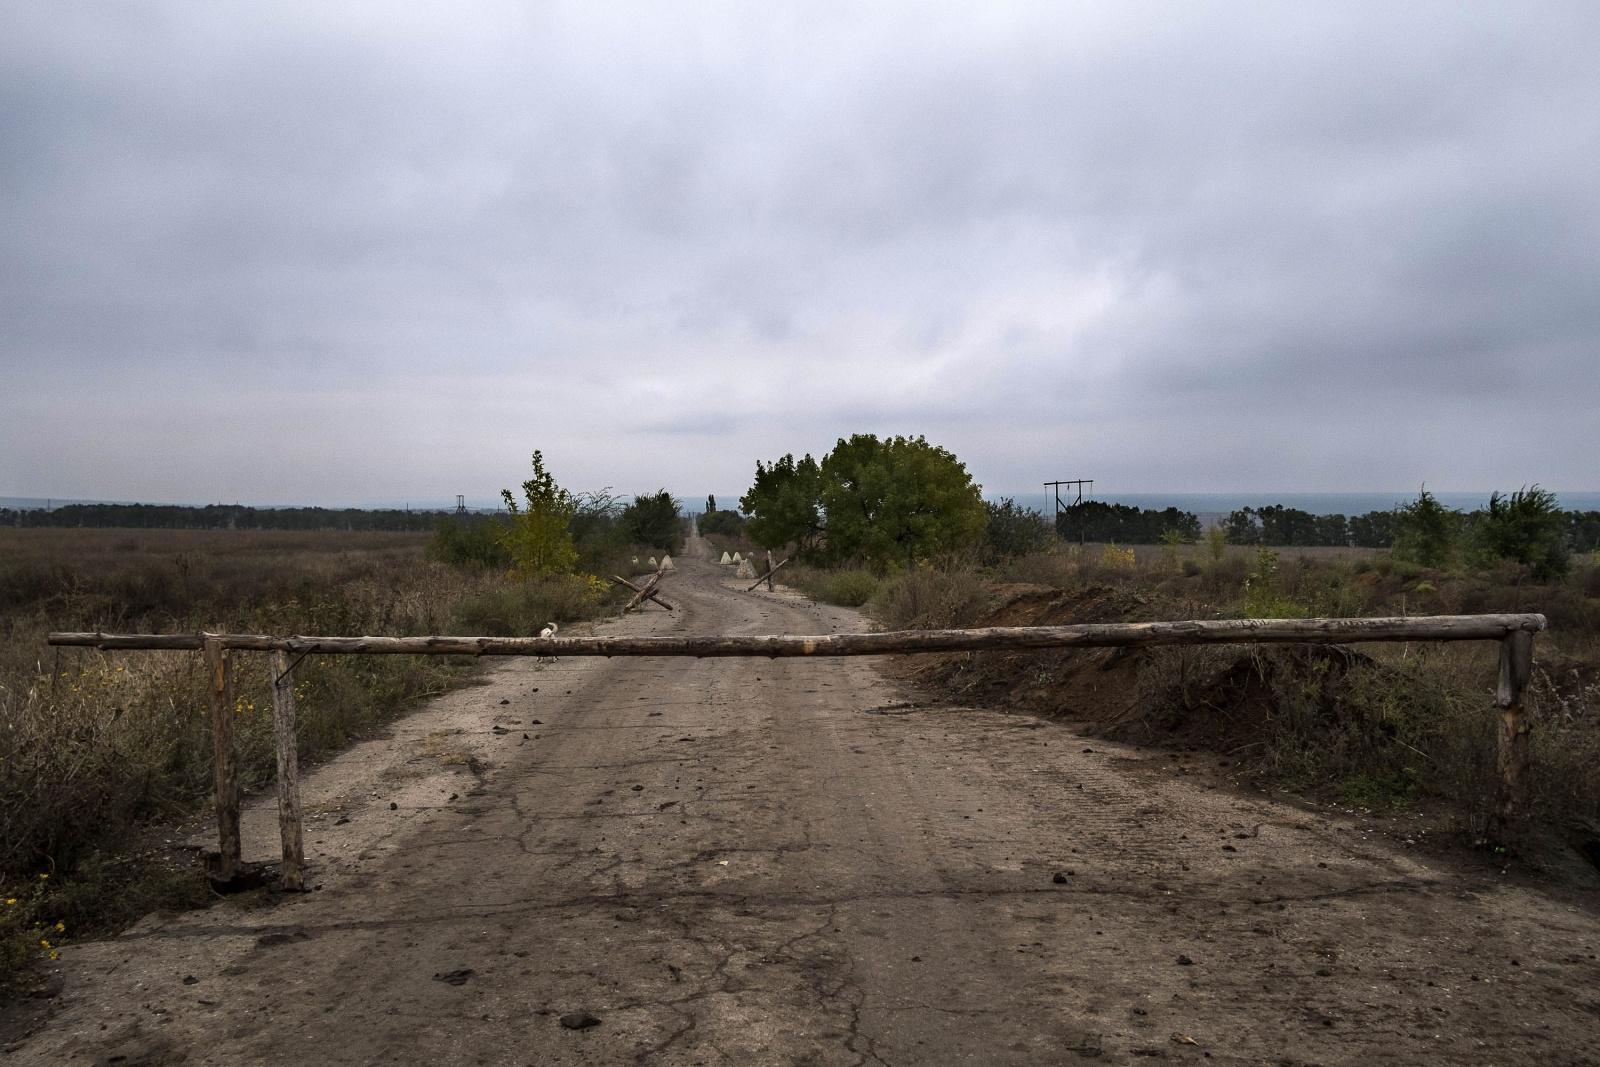 Ucraina - Donbass verso la pianura di Debaltseve